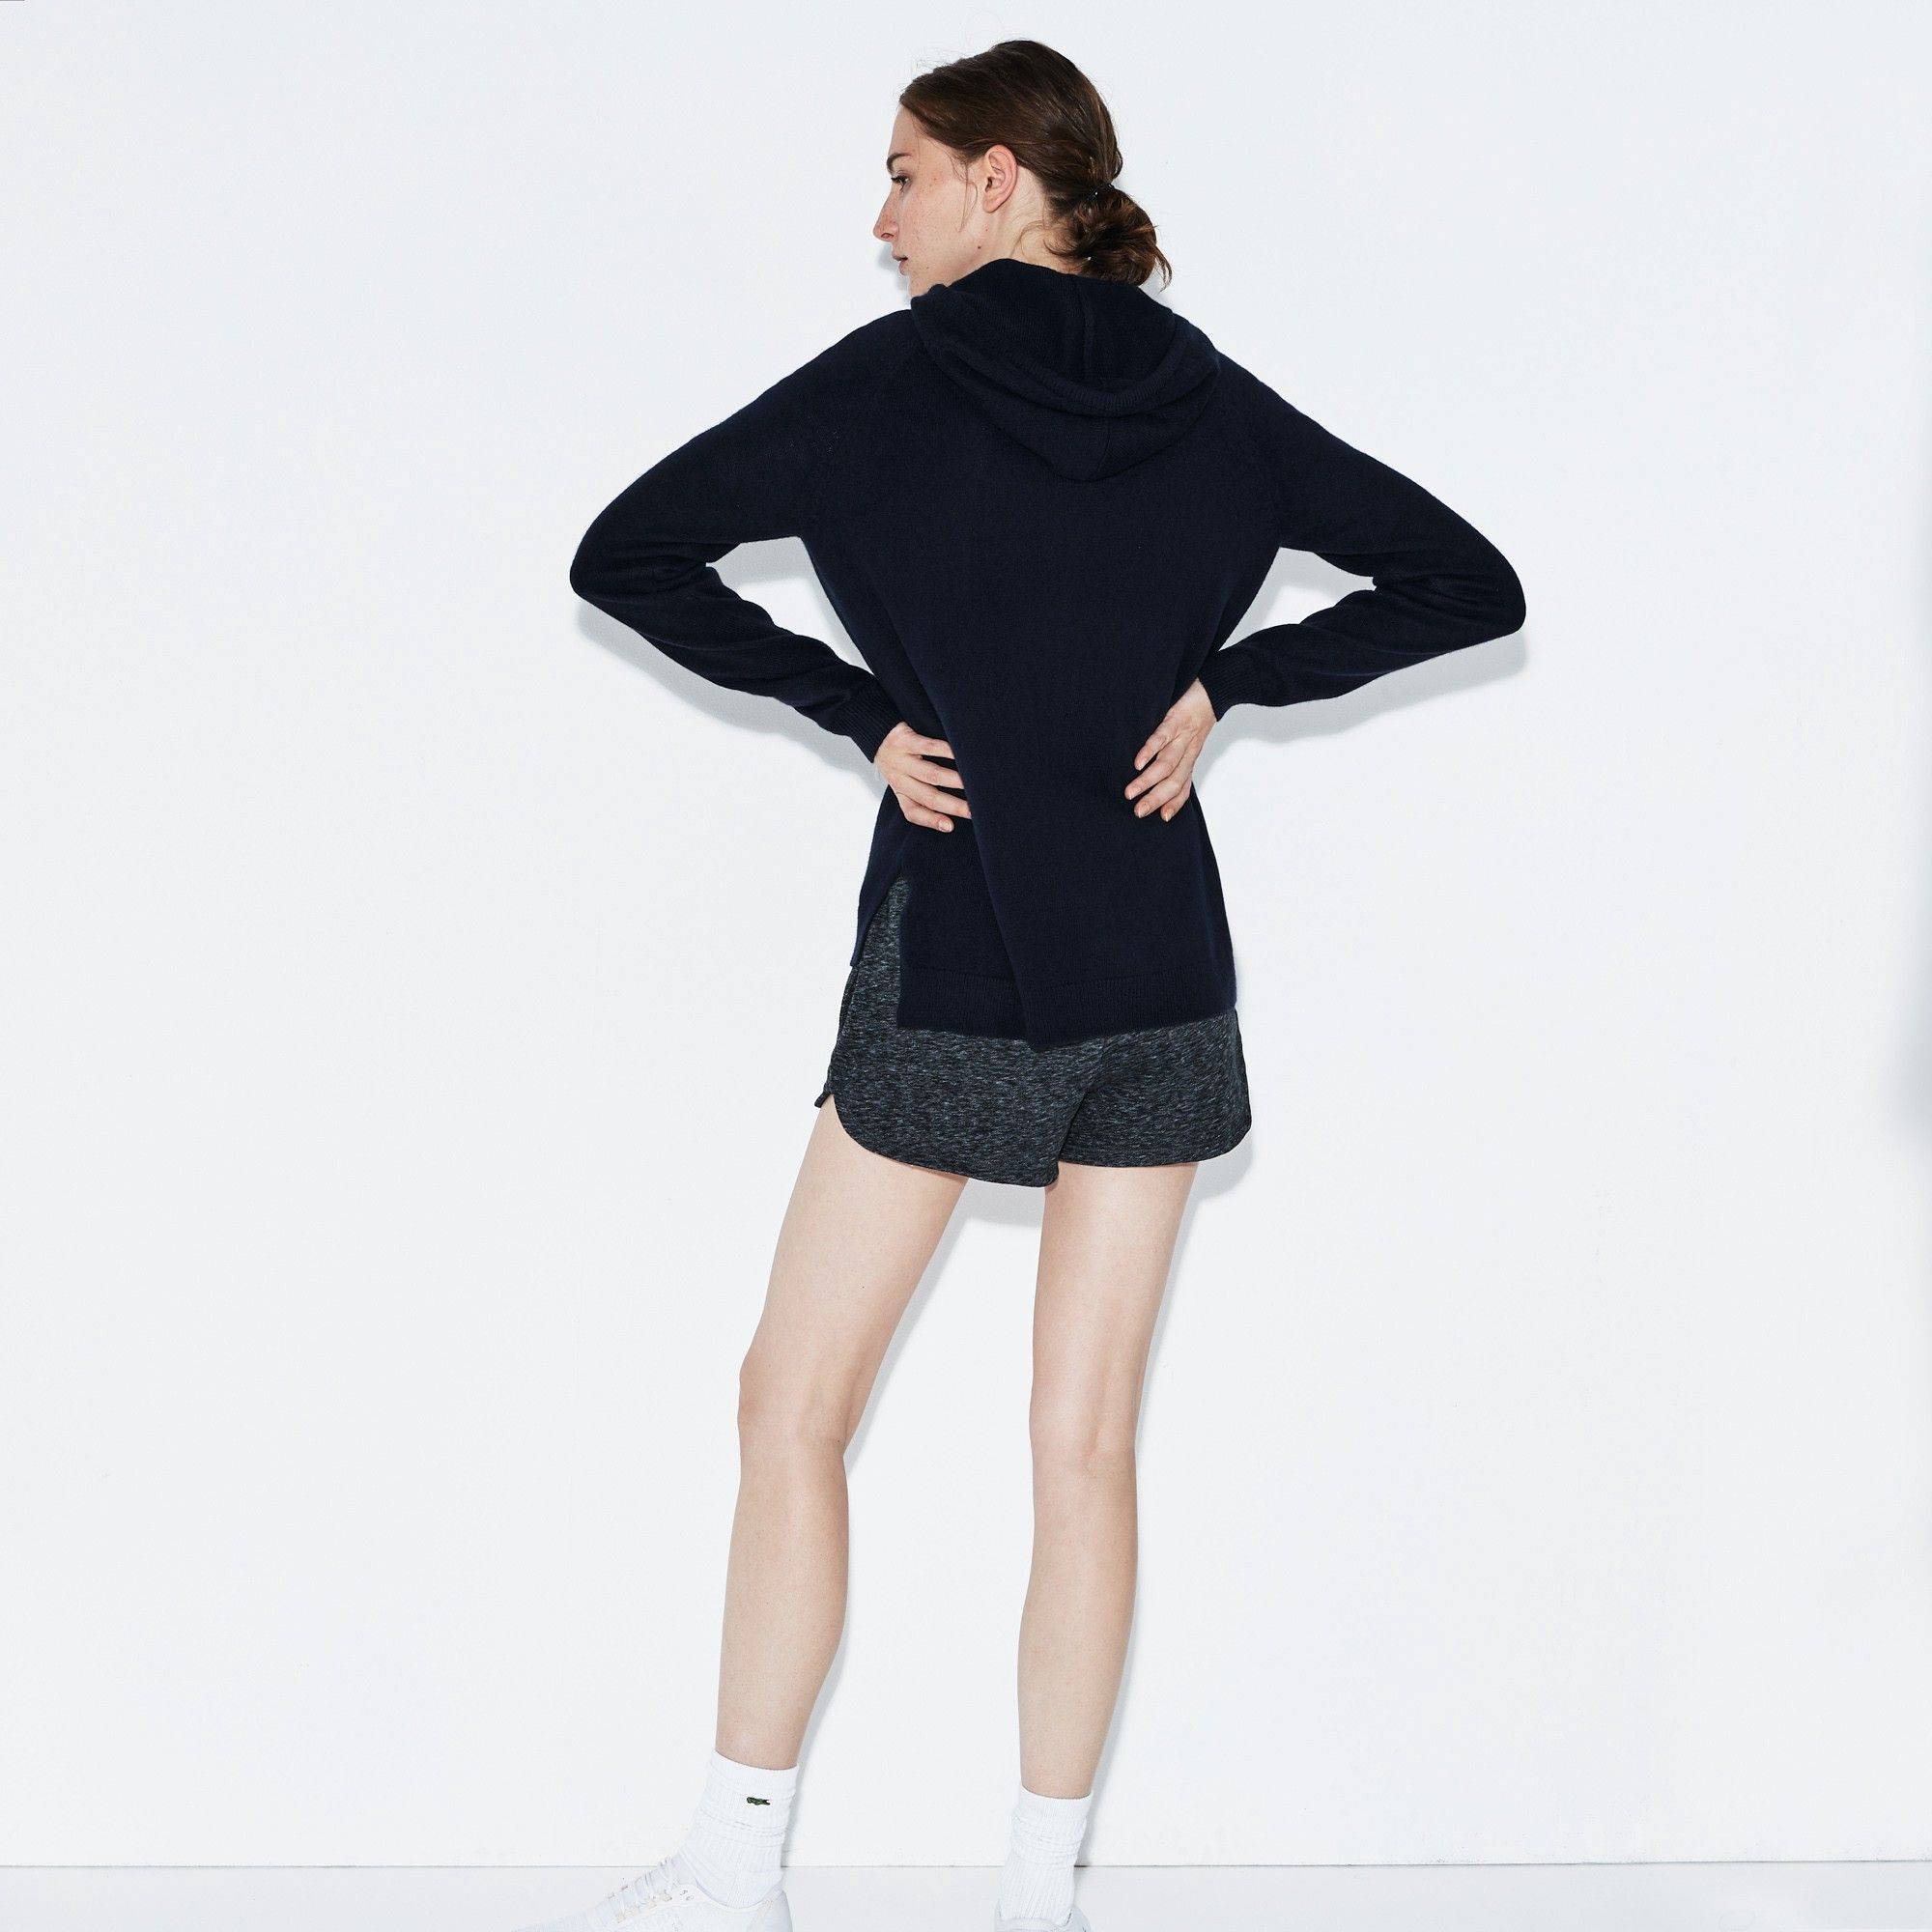 e04b2a05f1 Lacoste Women's Sport Tennis Cashmere Jersey Zip Sweatshirt - XXS ...